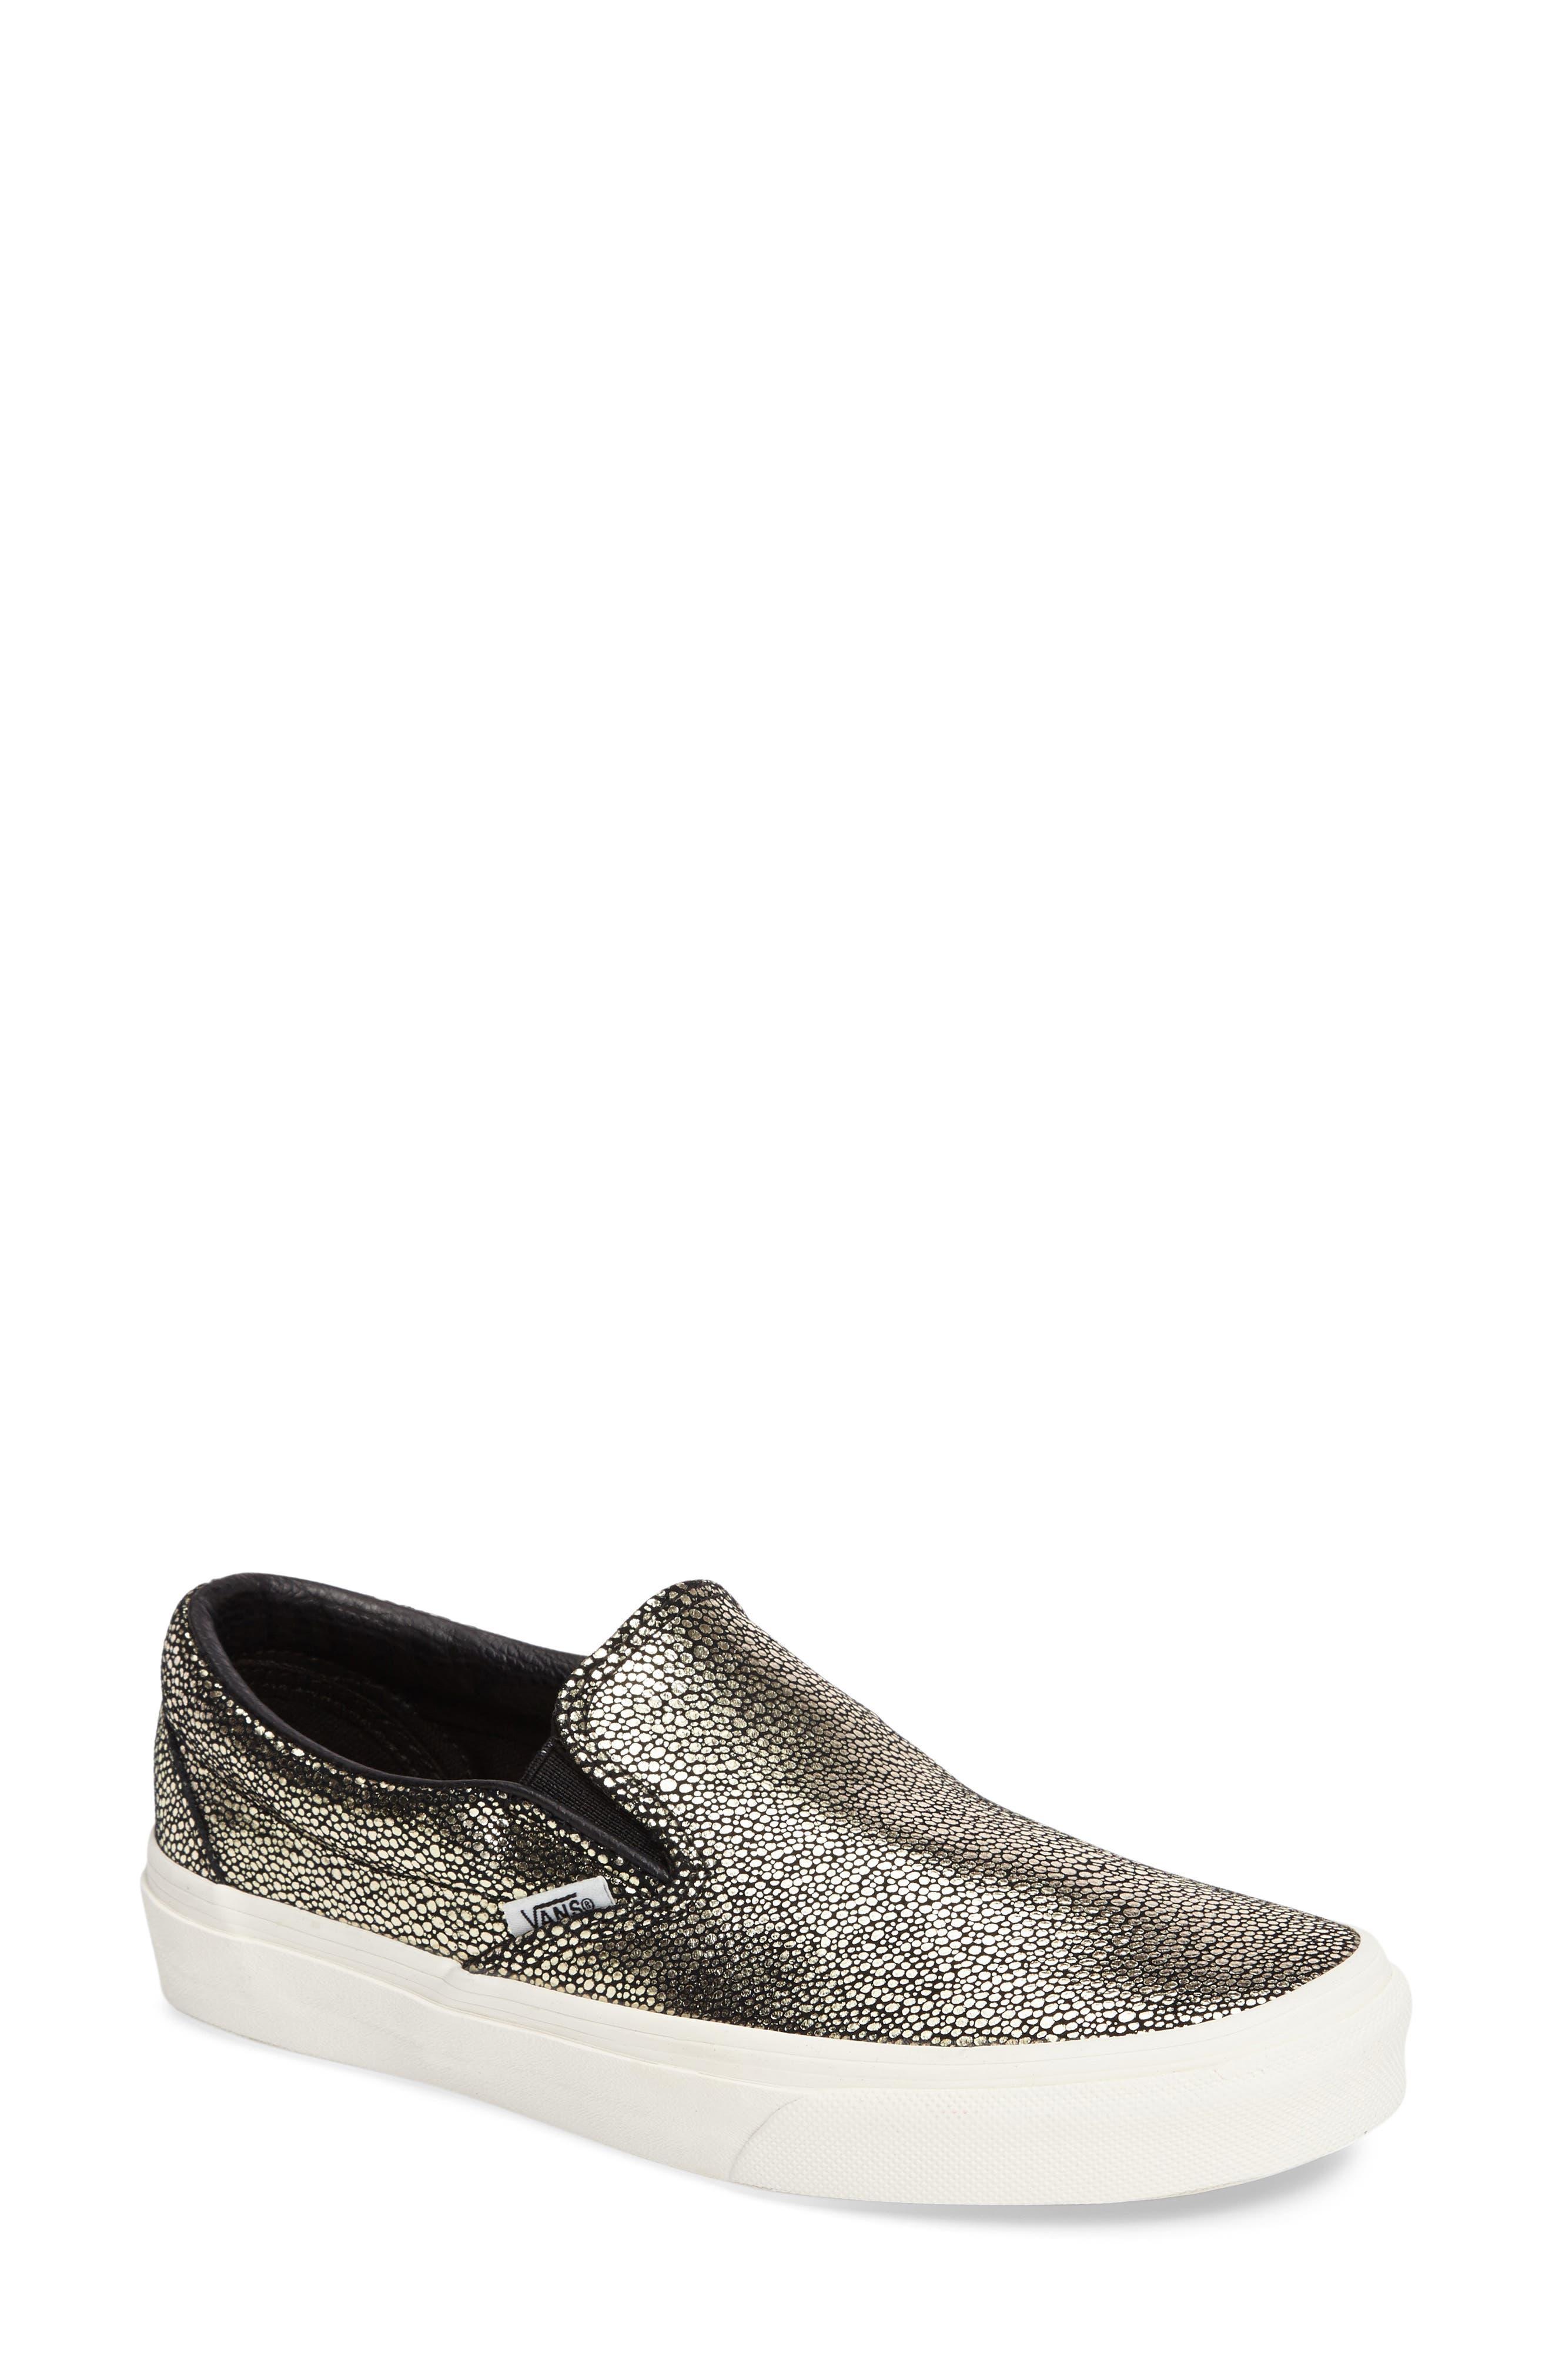 ,                             Classic Slip-On Sneaker,                             Main thumbnail 443, color,                             710